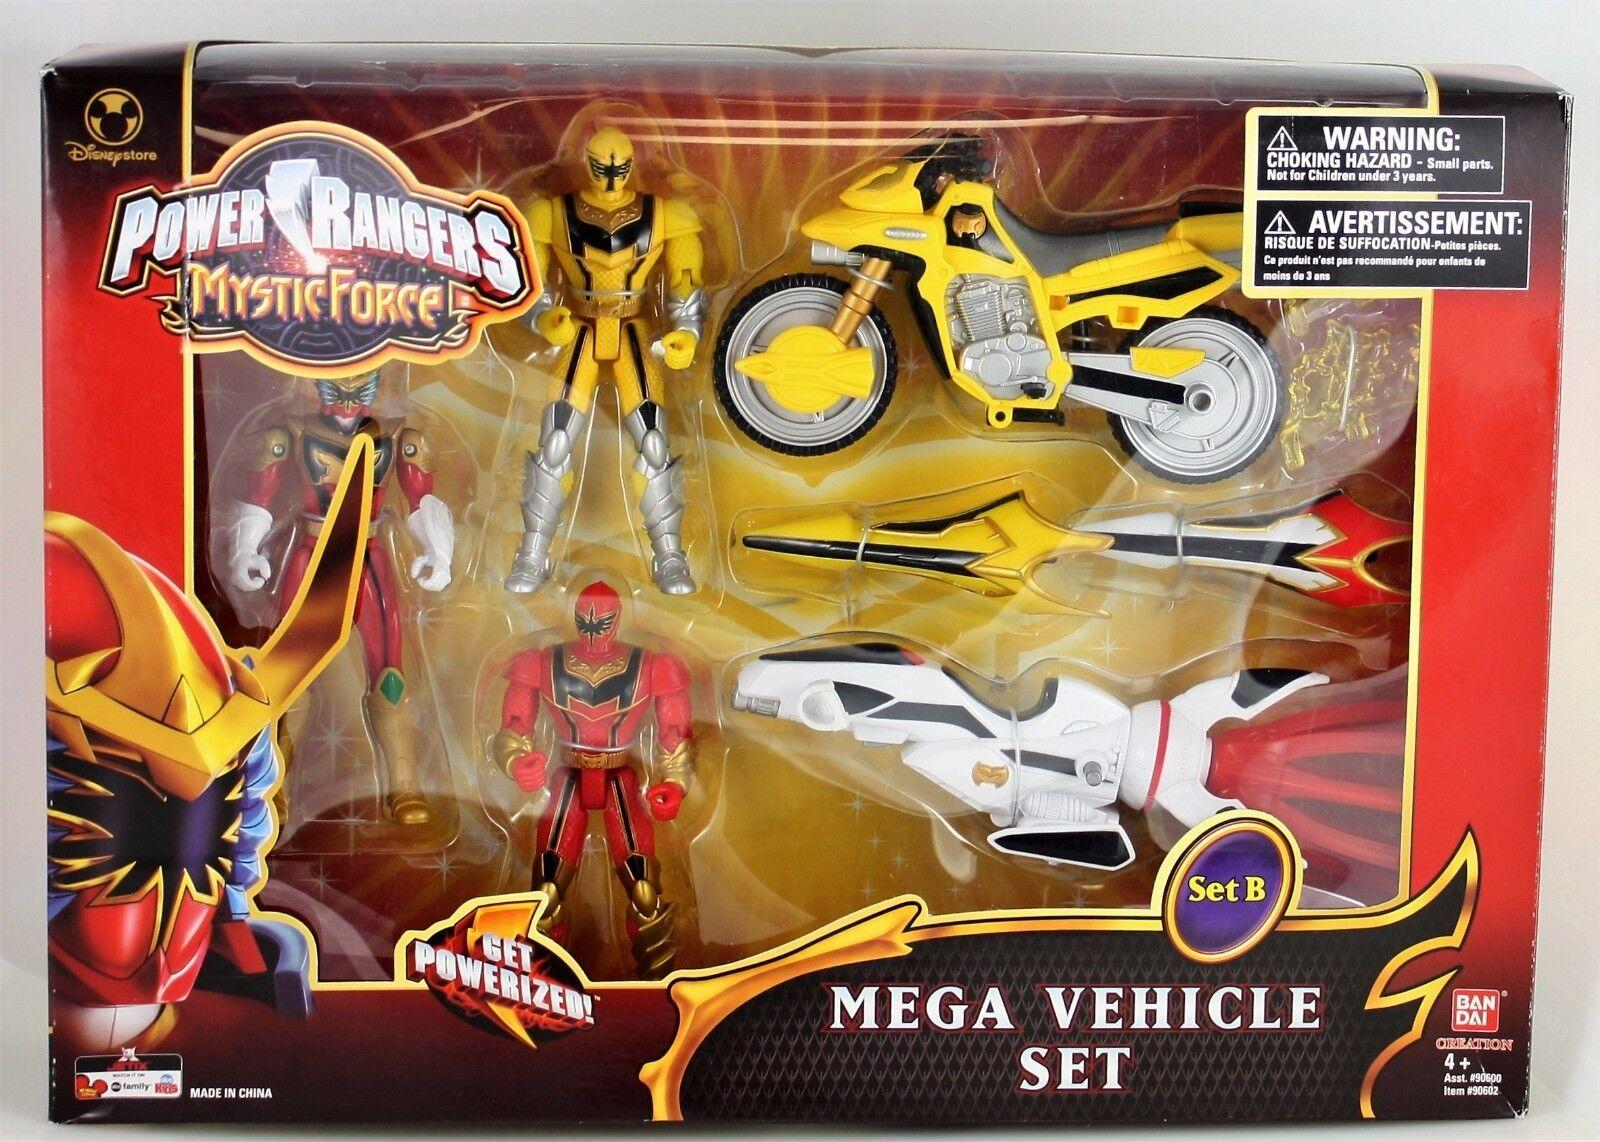 Power Rangers Mystic Force Mega Vehicle Set B